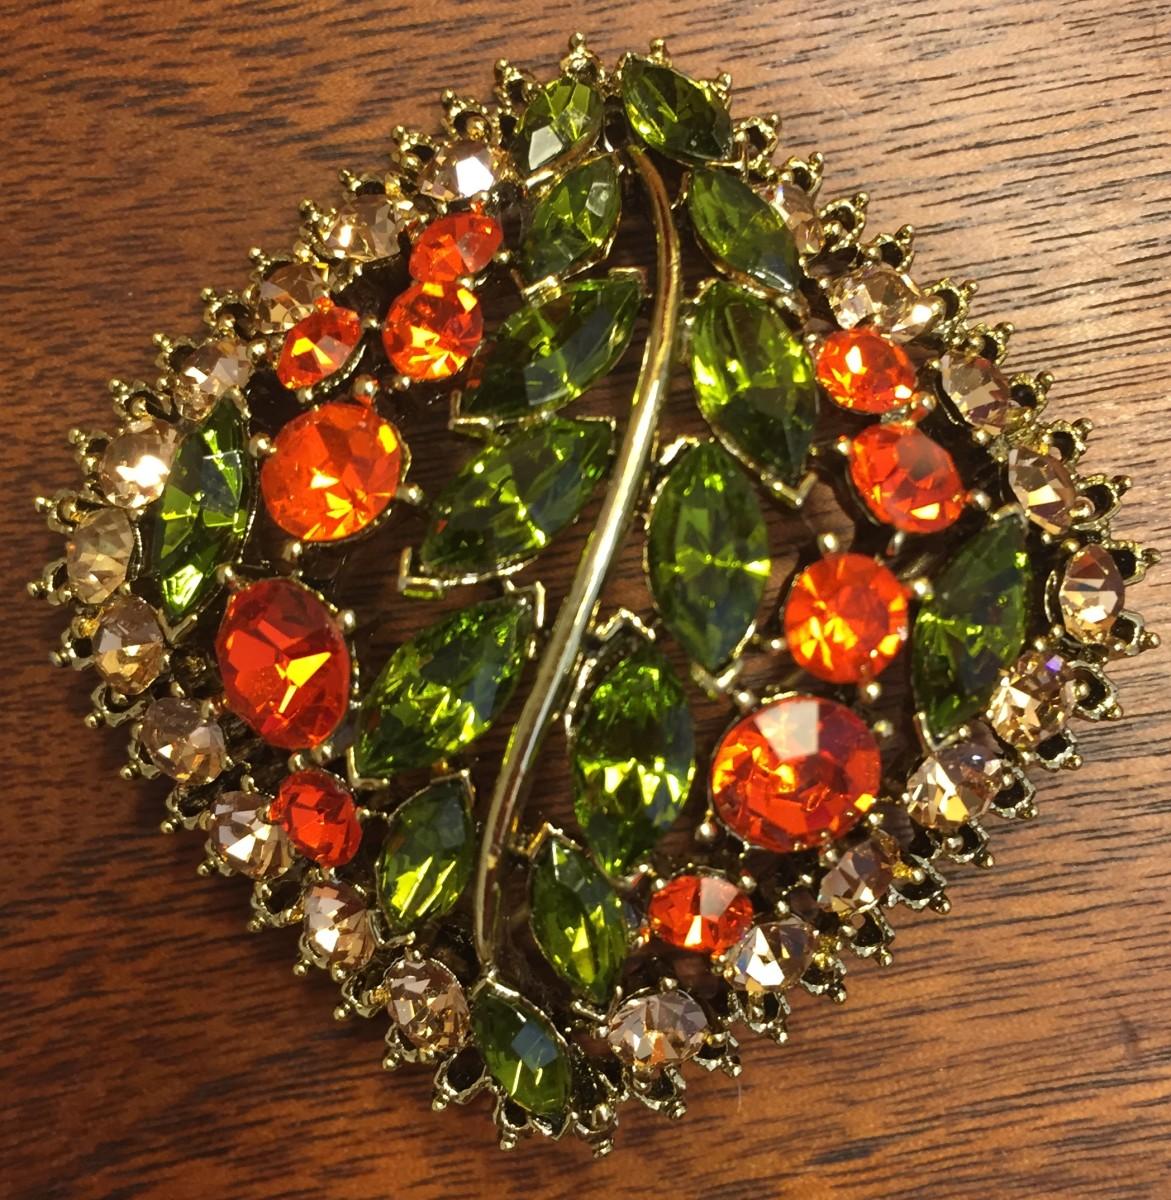 Brooch with colored rhinestones set in goldtone metal, 1950s-60s